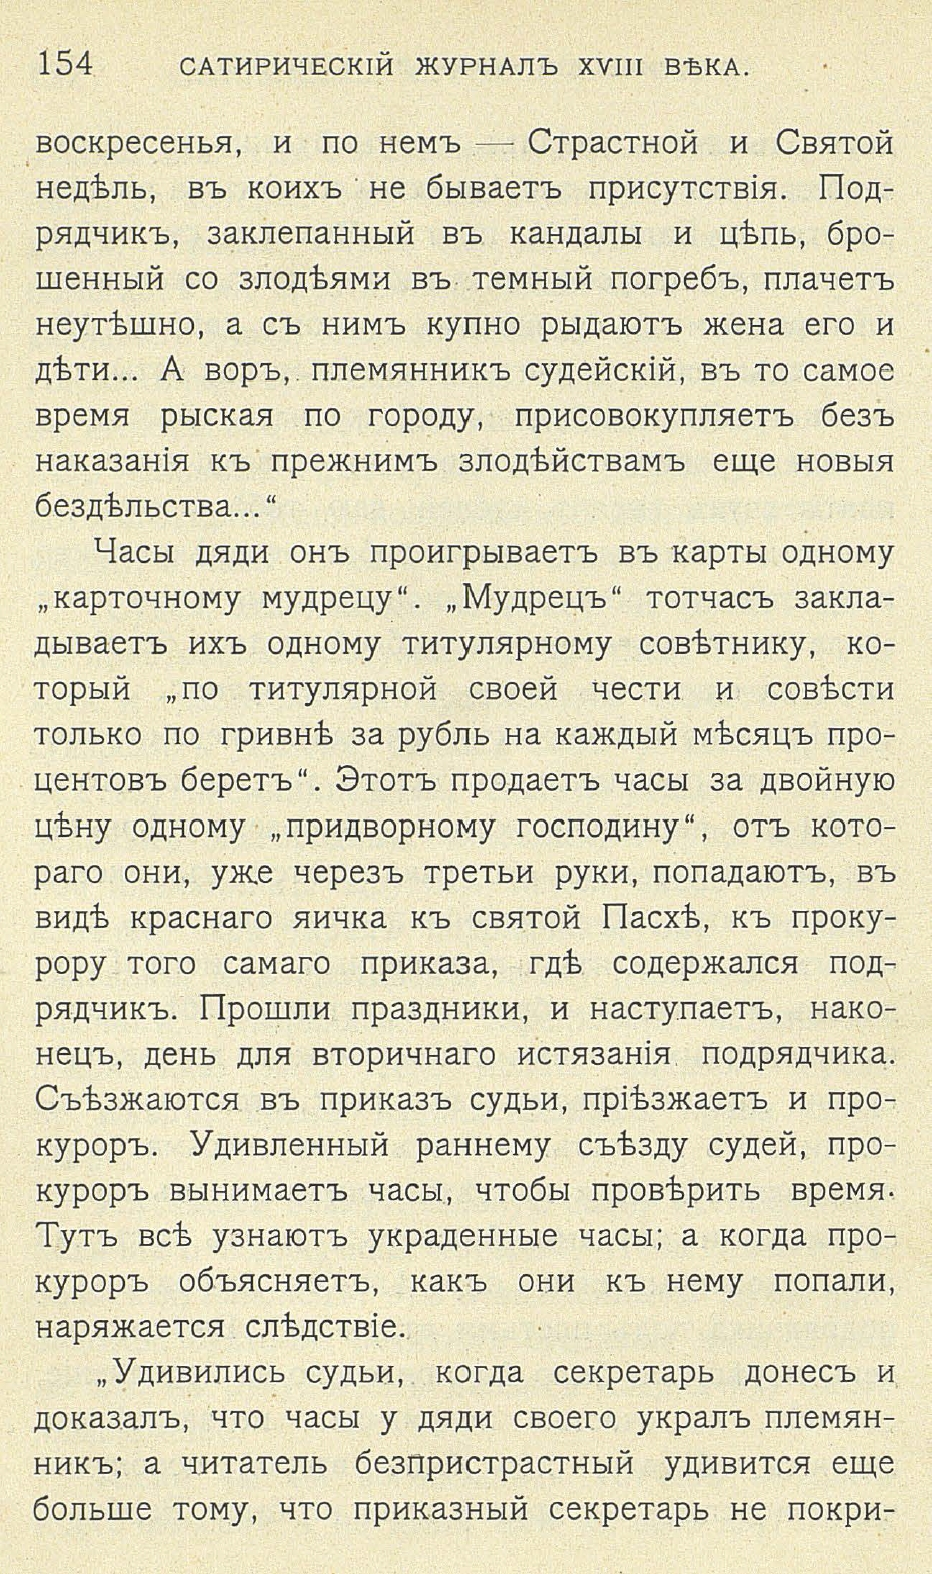 http://images.vfl.ru/ii/1407086397/c44ee6db/5887738.jpg